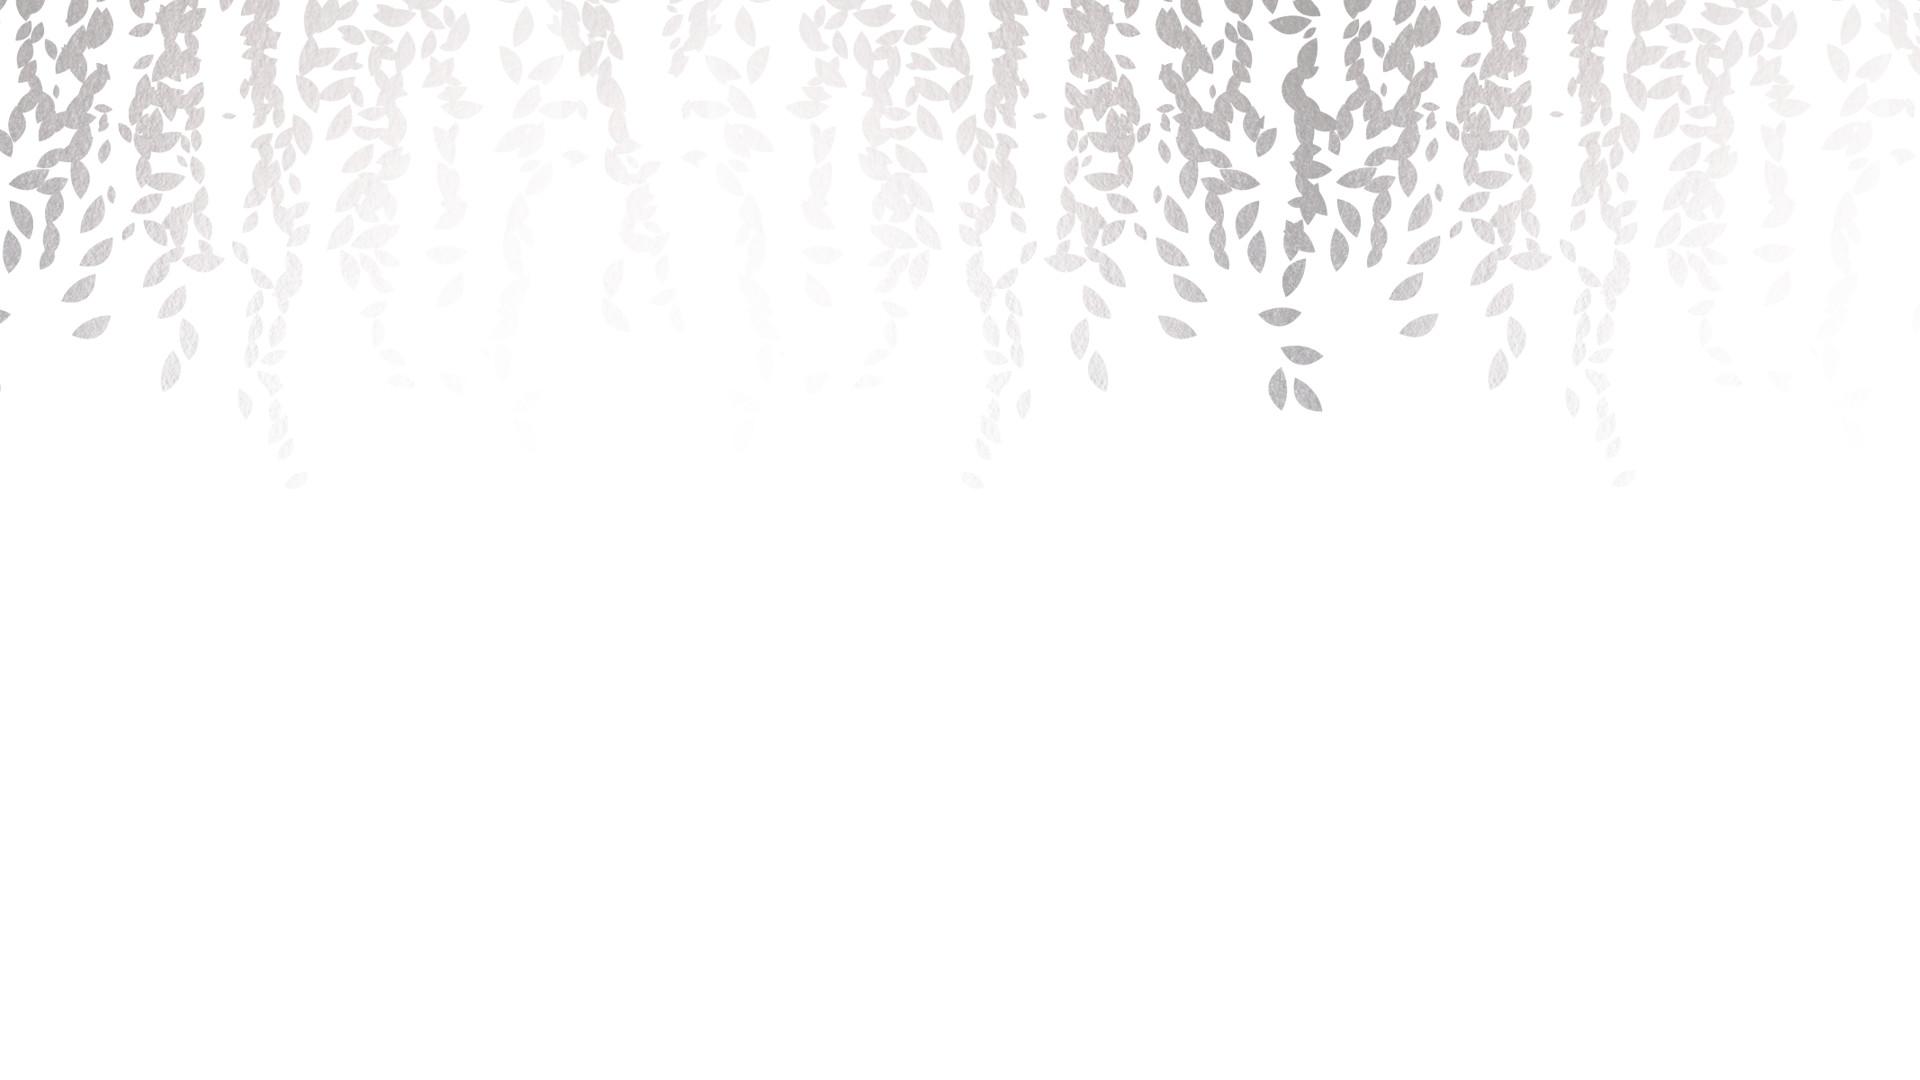 Website Background Or Wring Paper Wedding Invitation 1920x1080